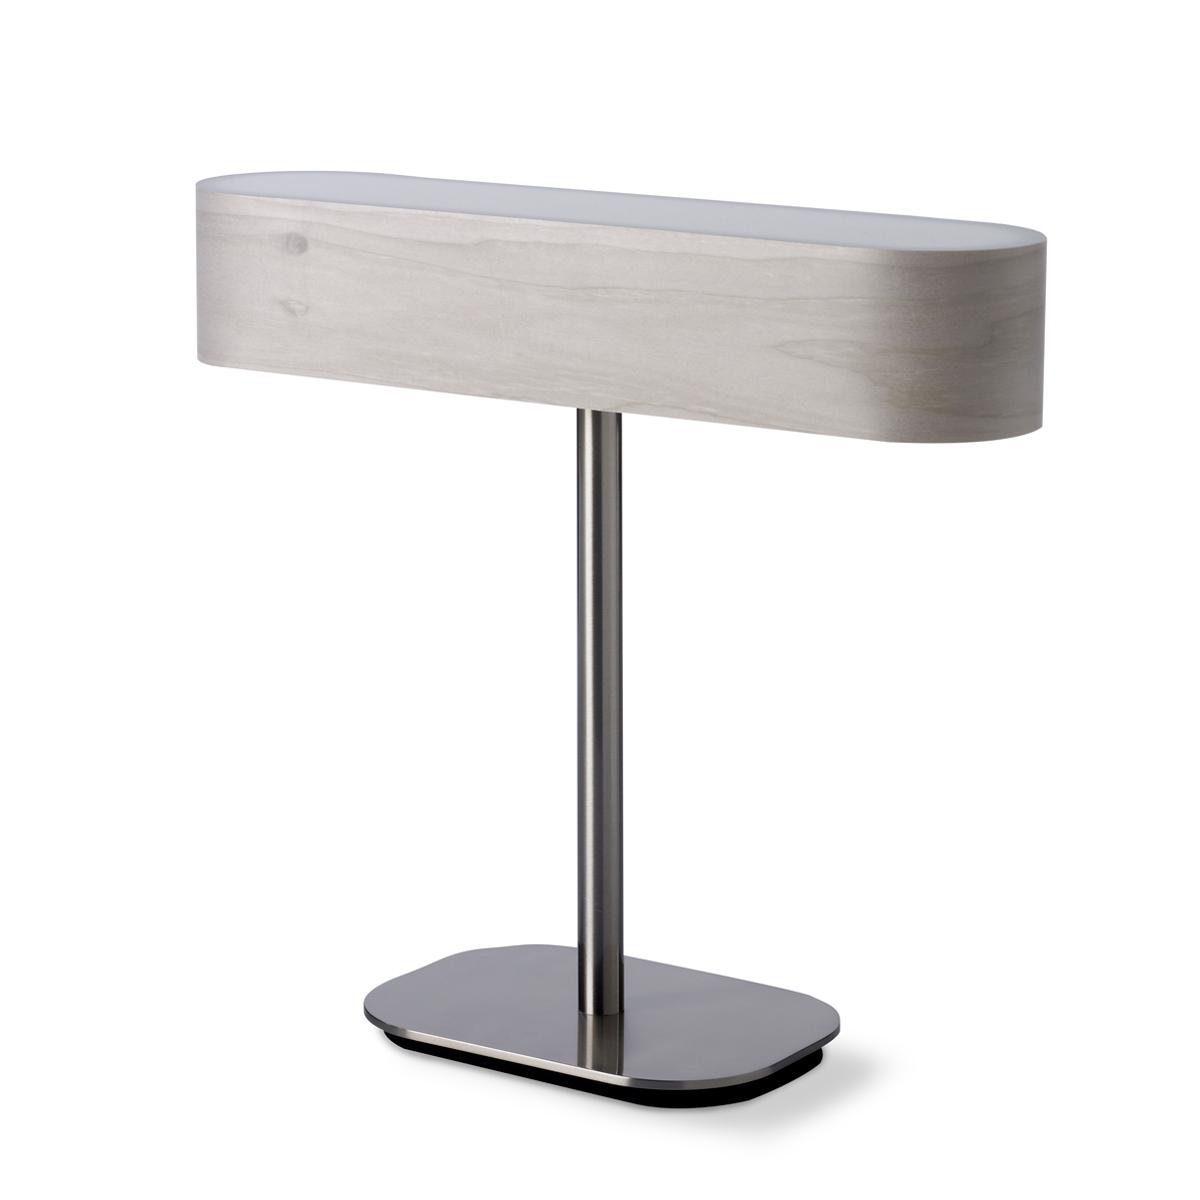 LZF Lamps I-Club LED Tischleuchte I M LED DIM 29